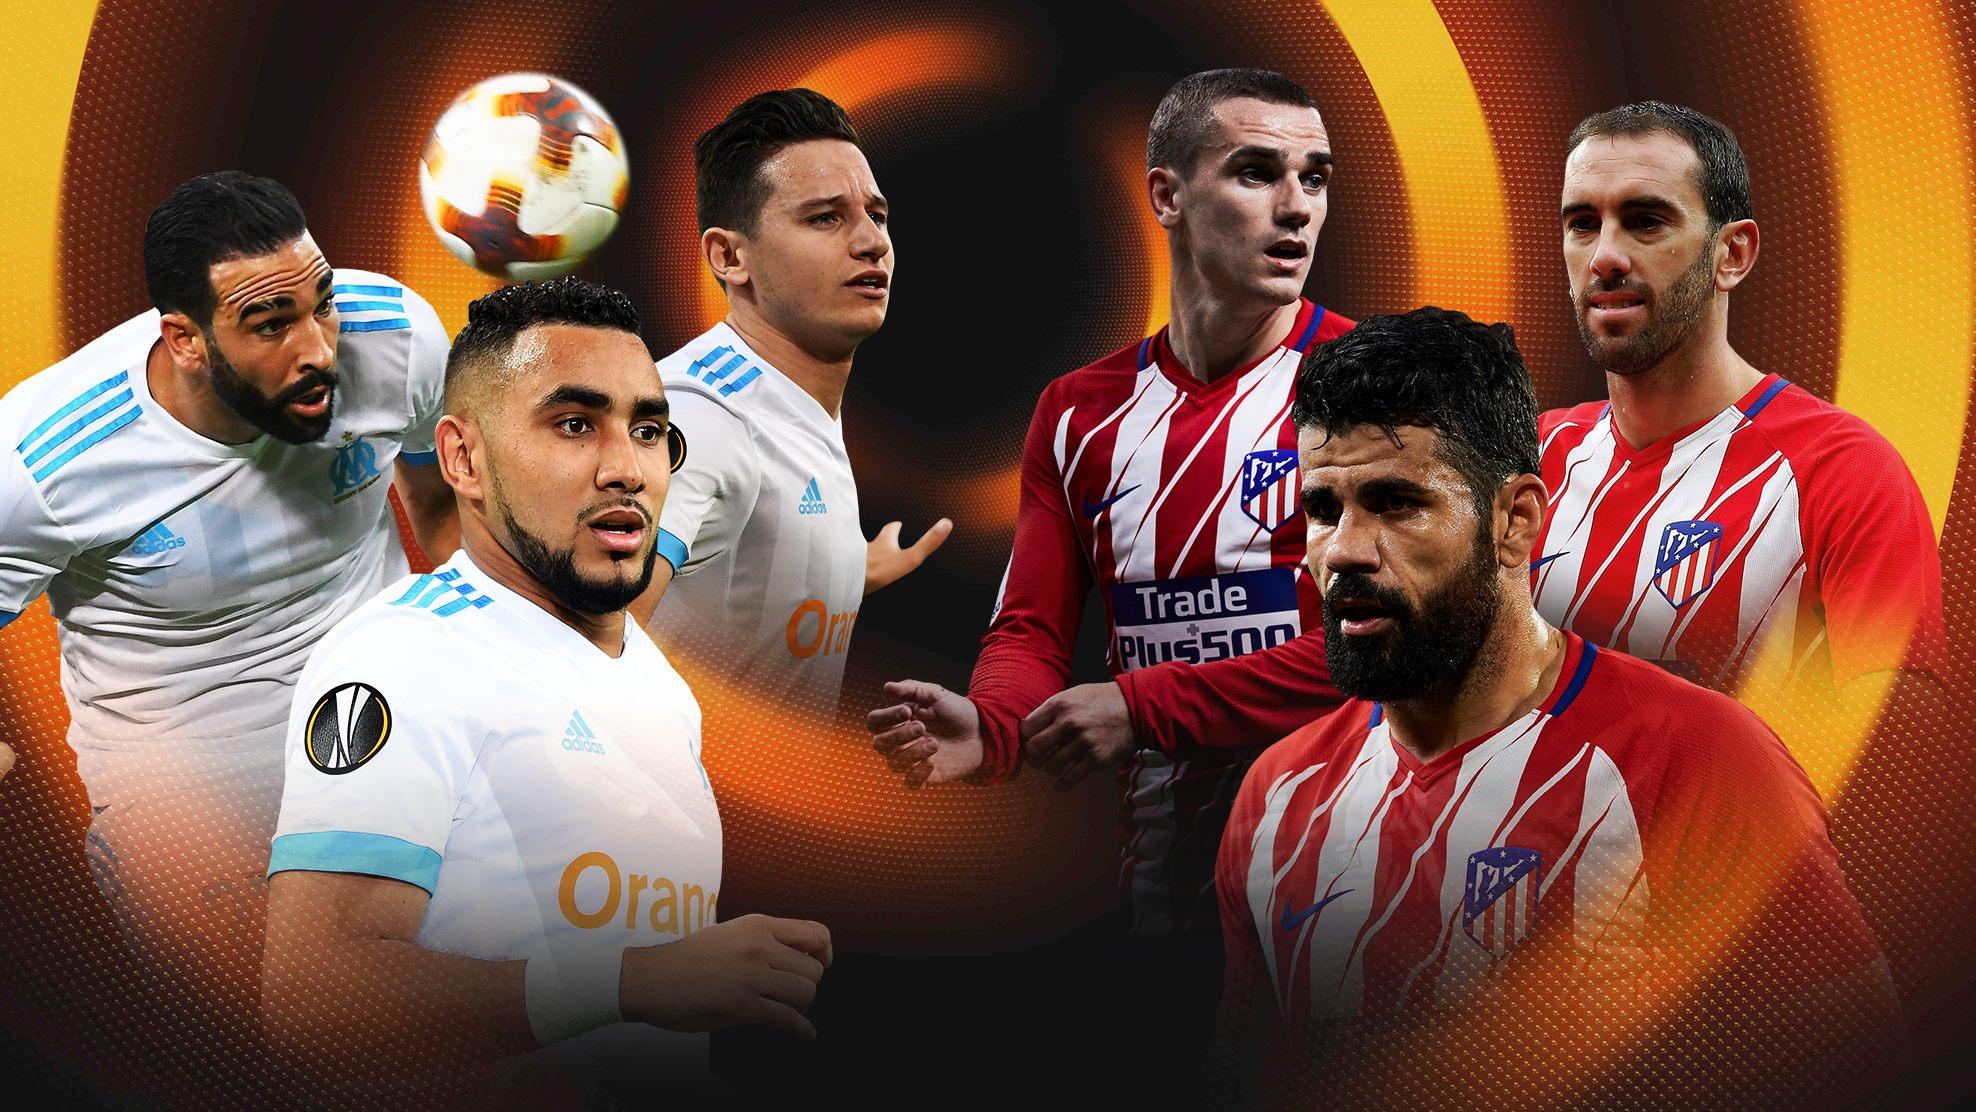 Finale UEFA Europa League - Les gagnants